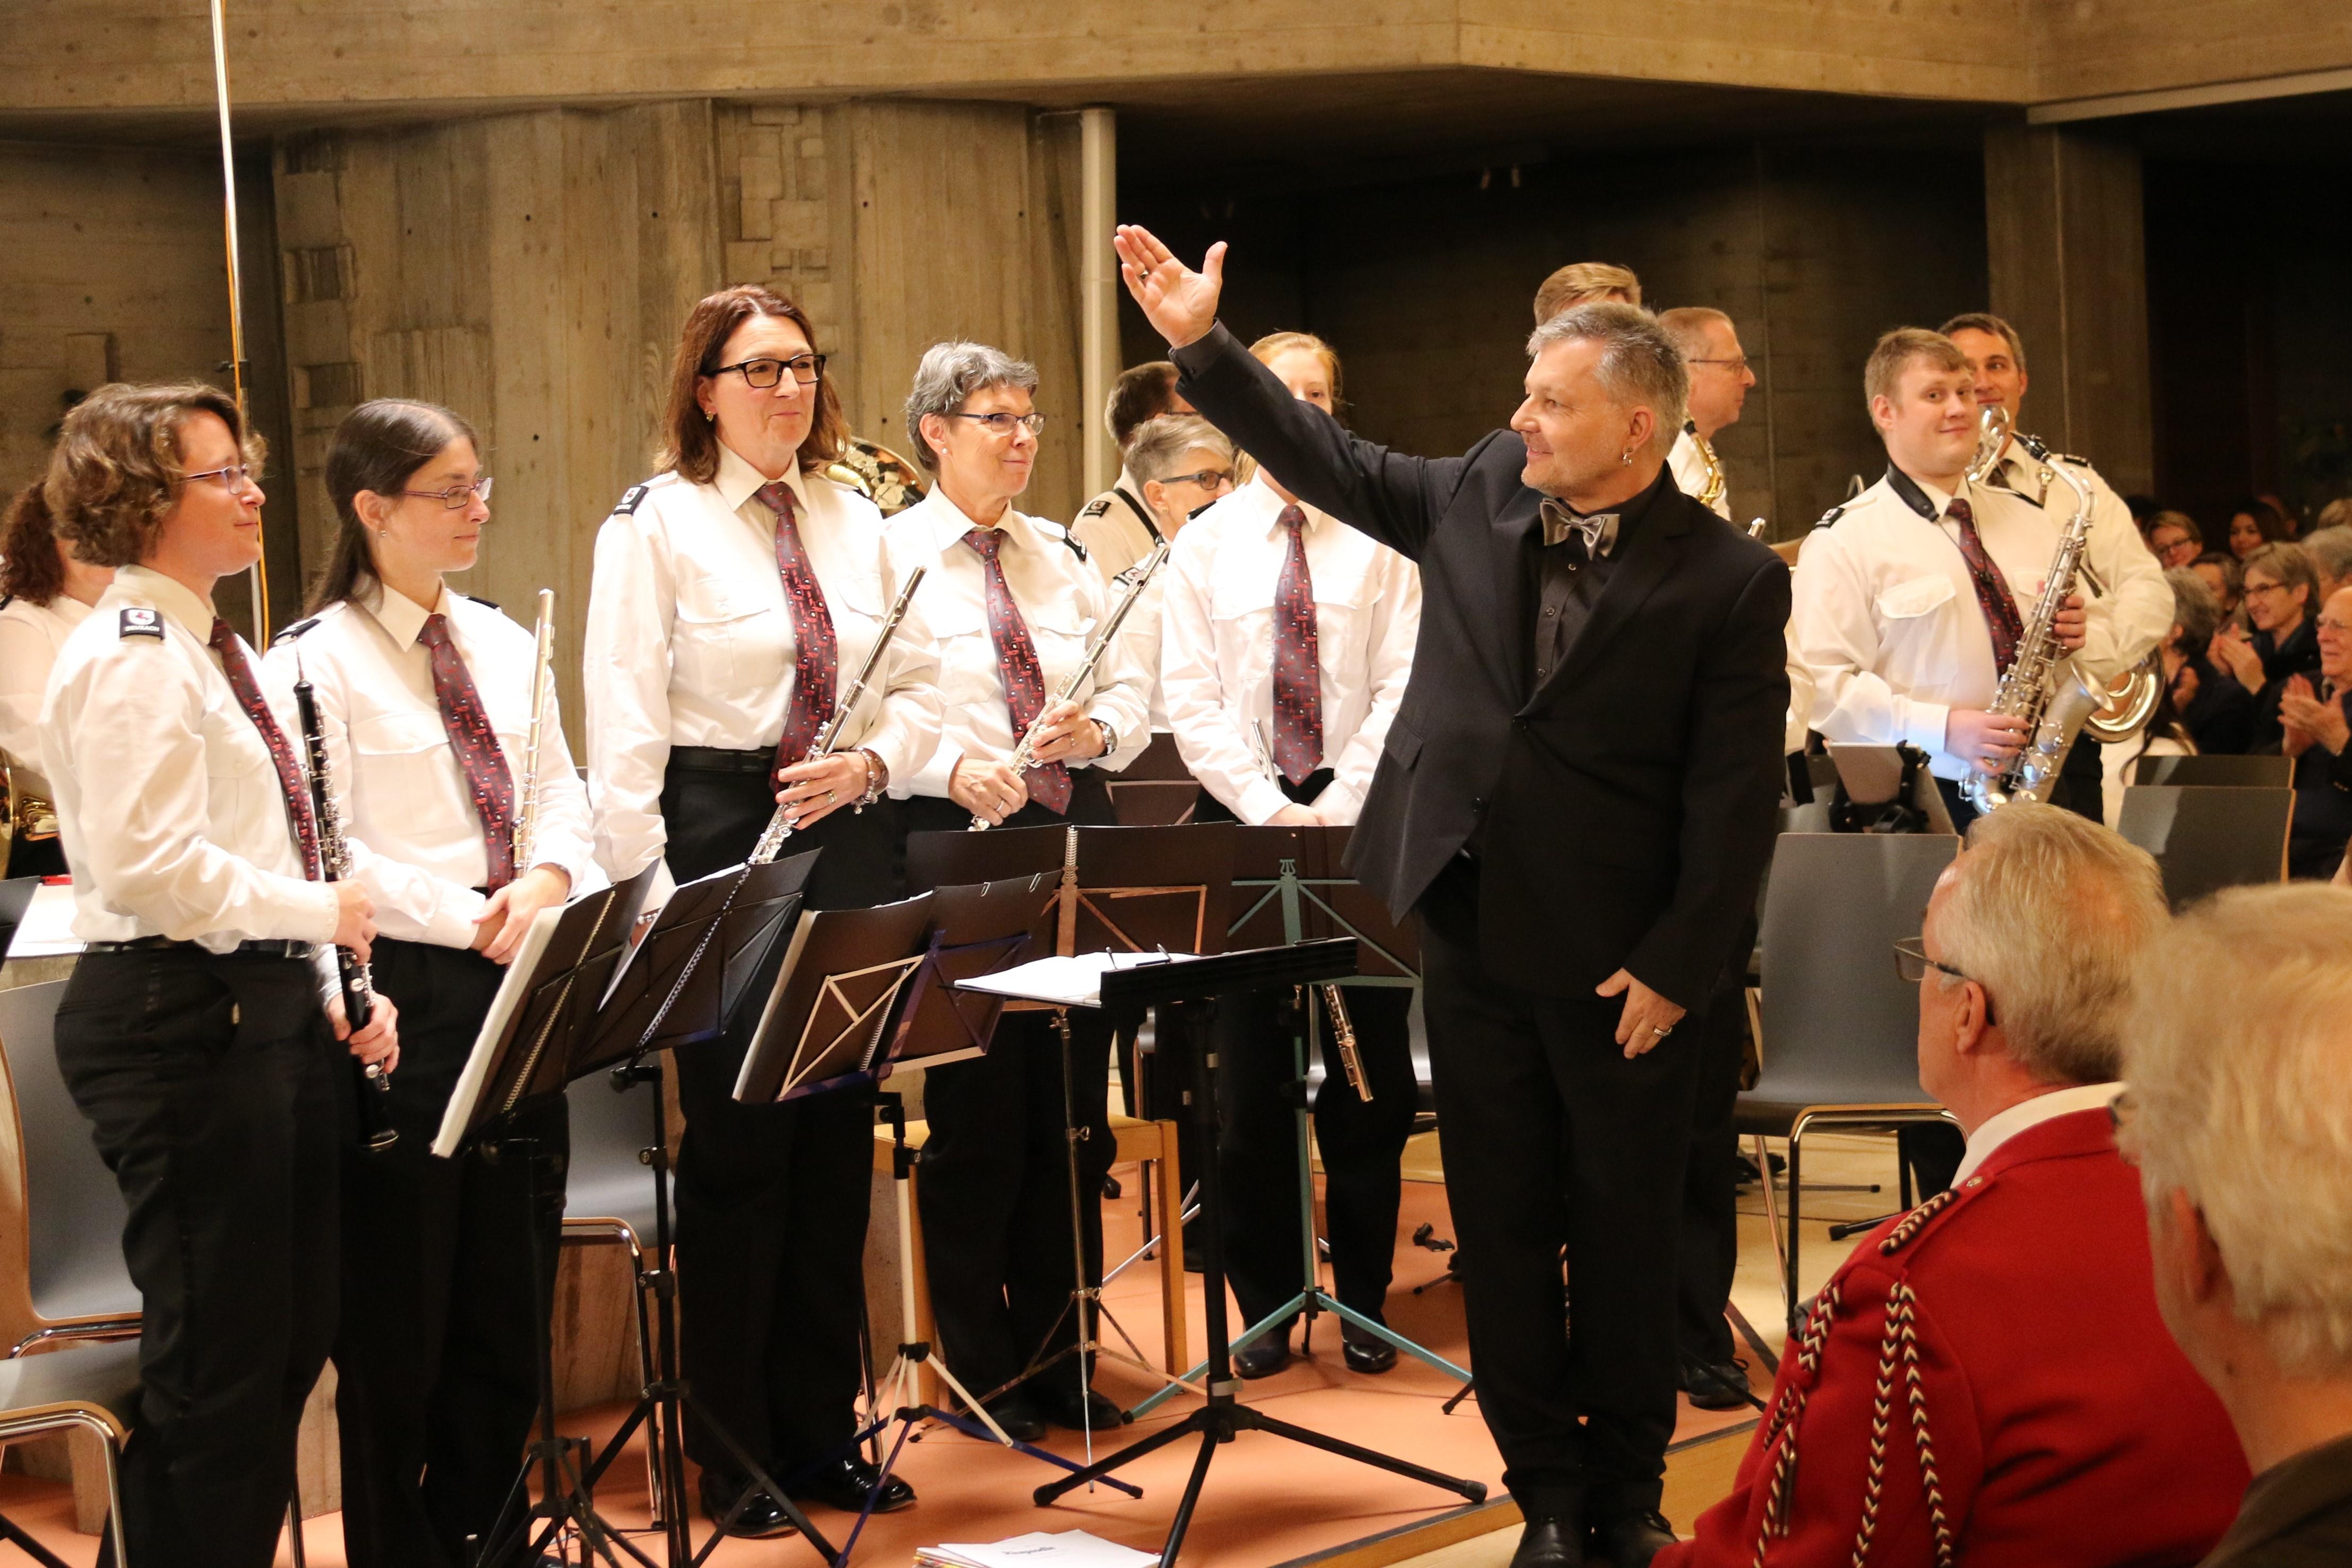 Kirchenkonzert am 24. November in der Kath. Kirche